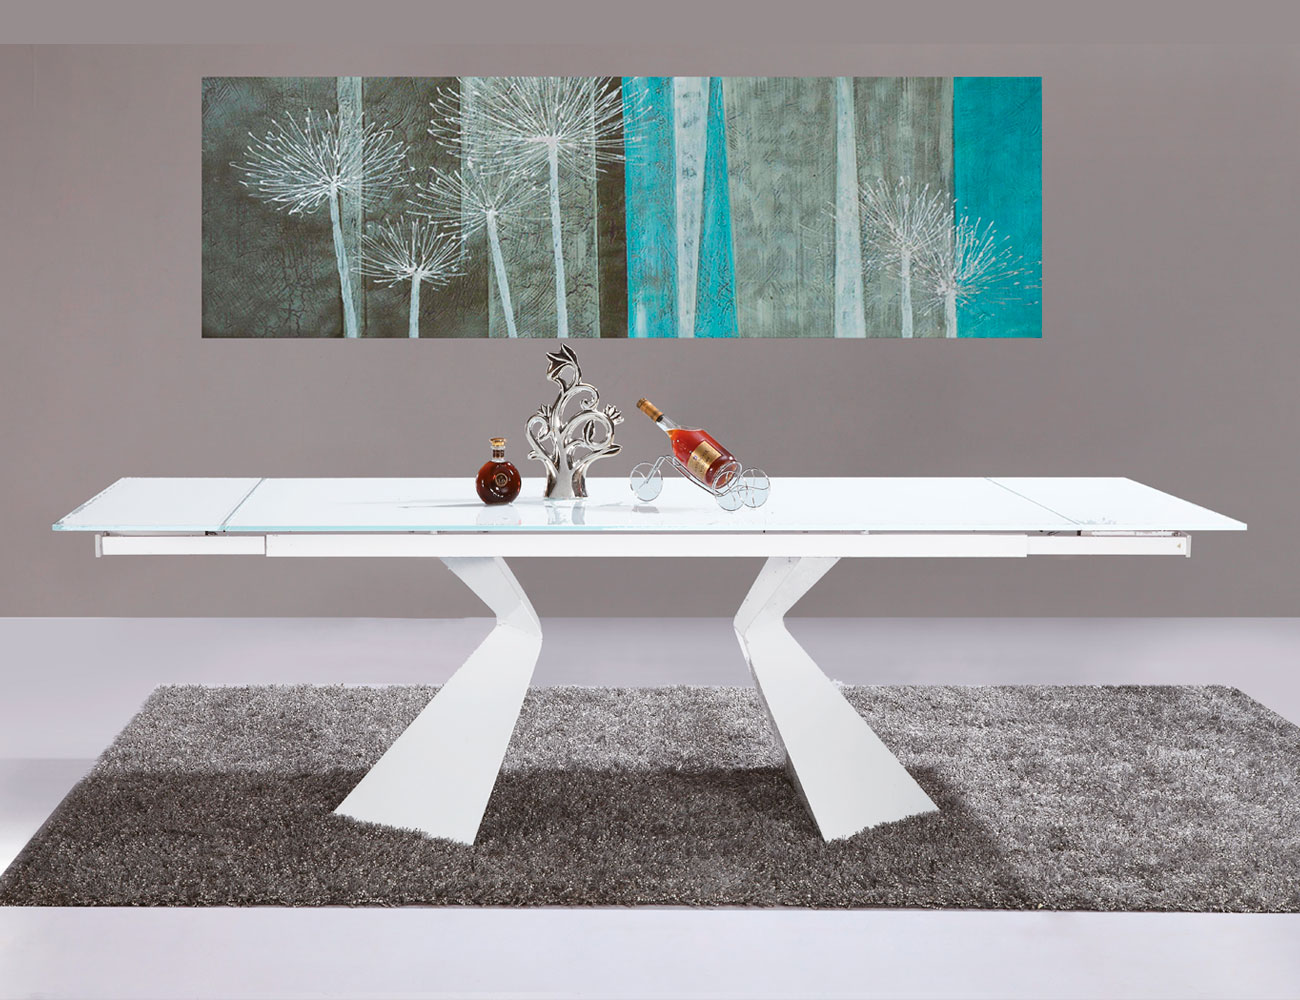 Mesa de comedor de cristal templado extensible 180 a 250 cm de ancho 7461 factory del mueble - Mesa comedor blanca extensible ...